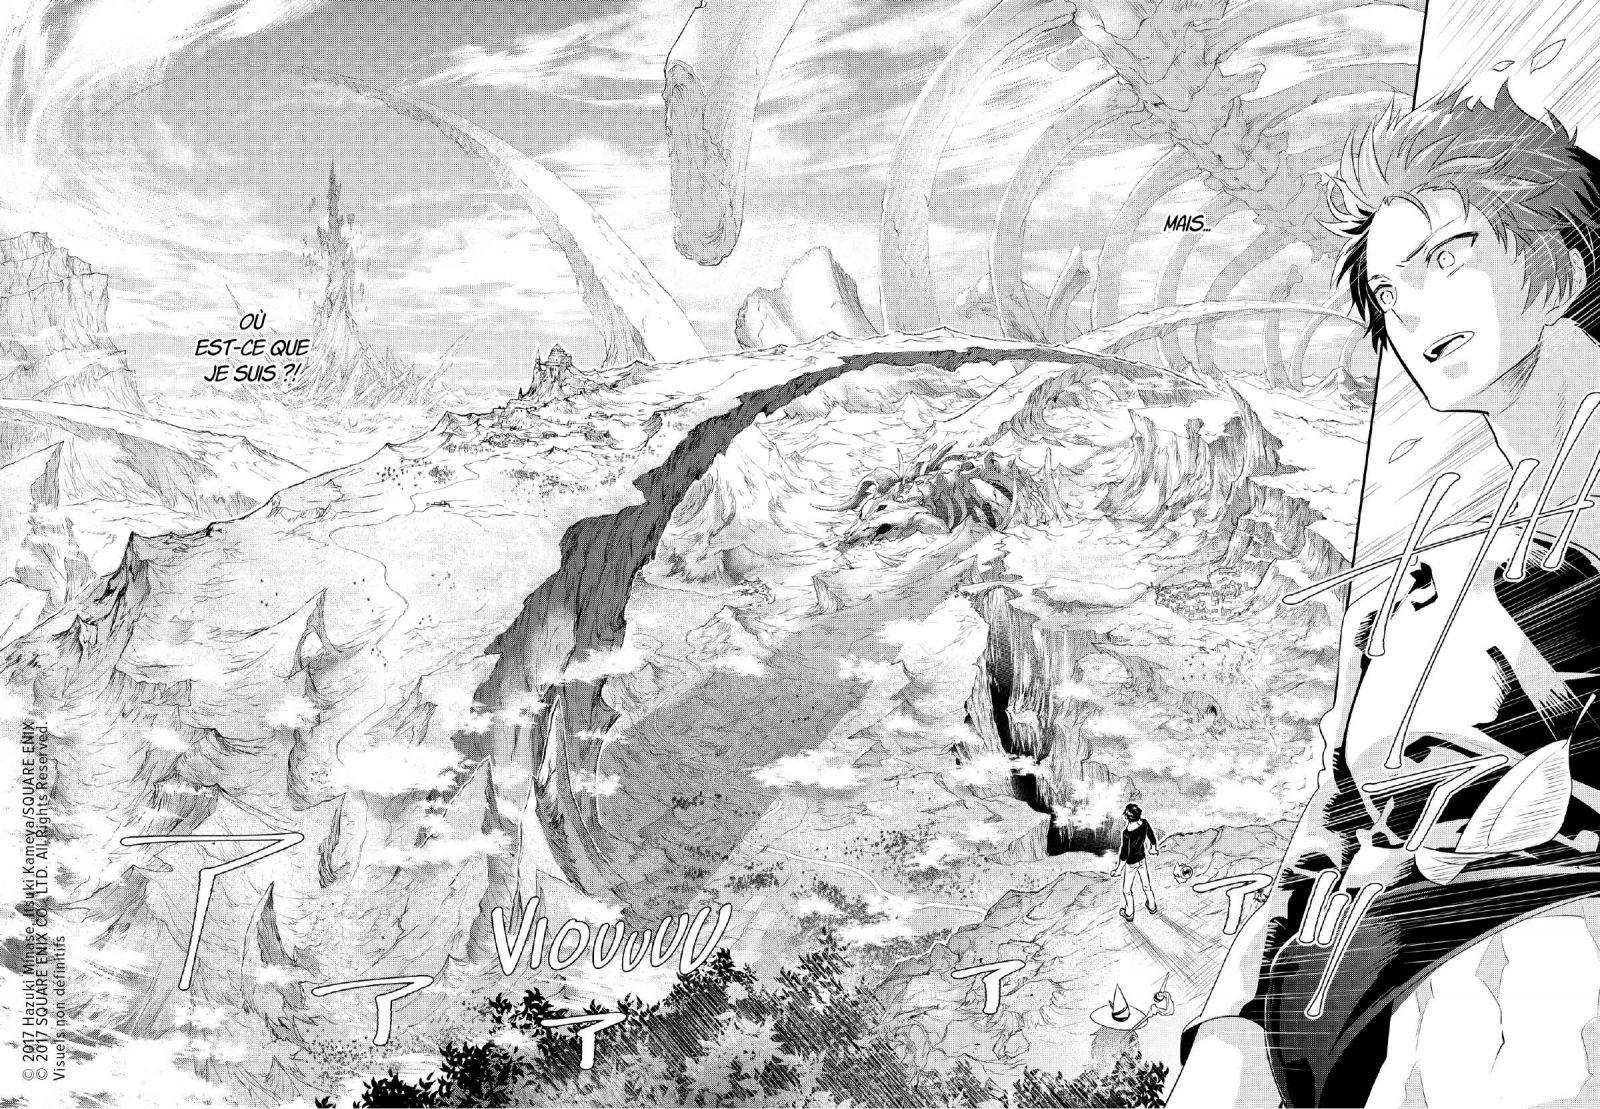 [Manga] Final Fantasy Lost Stranger FINALFANTASYLOSTSTRANGER_01_WEB_Facebook-Banniere3